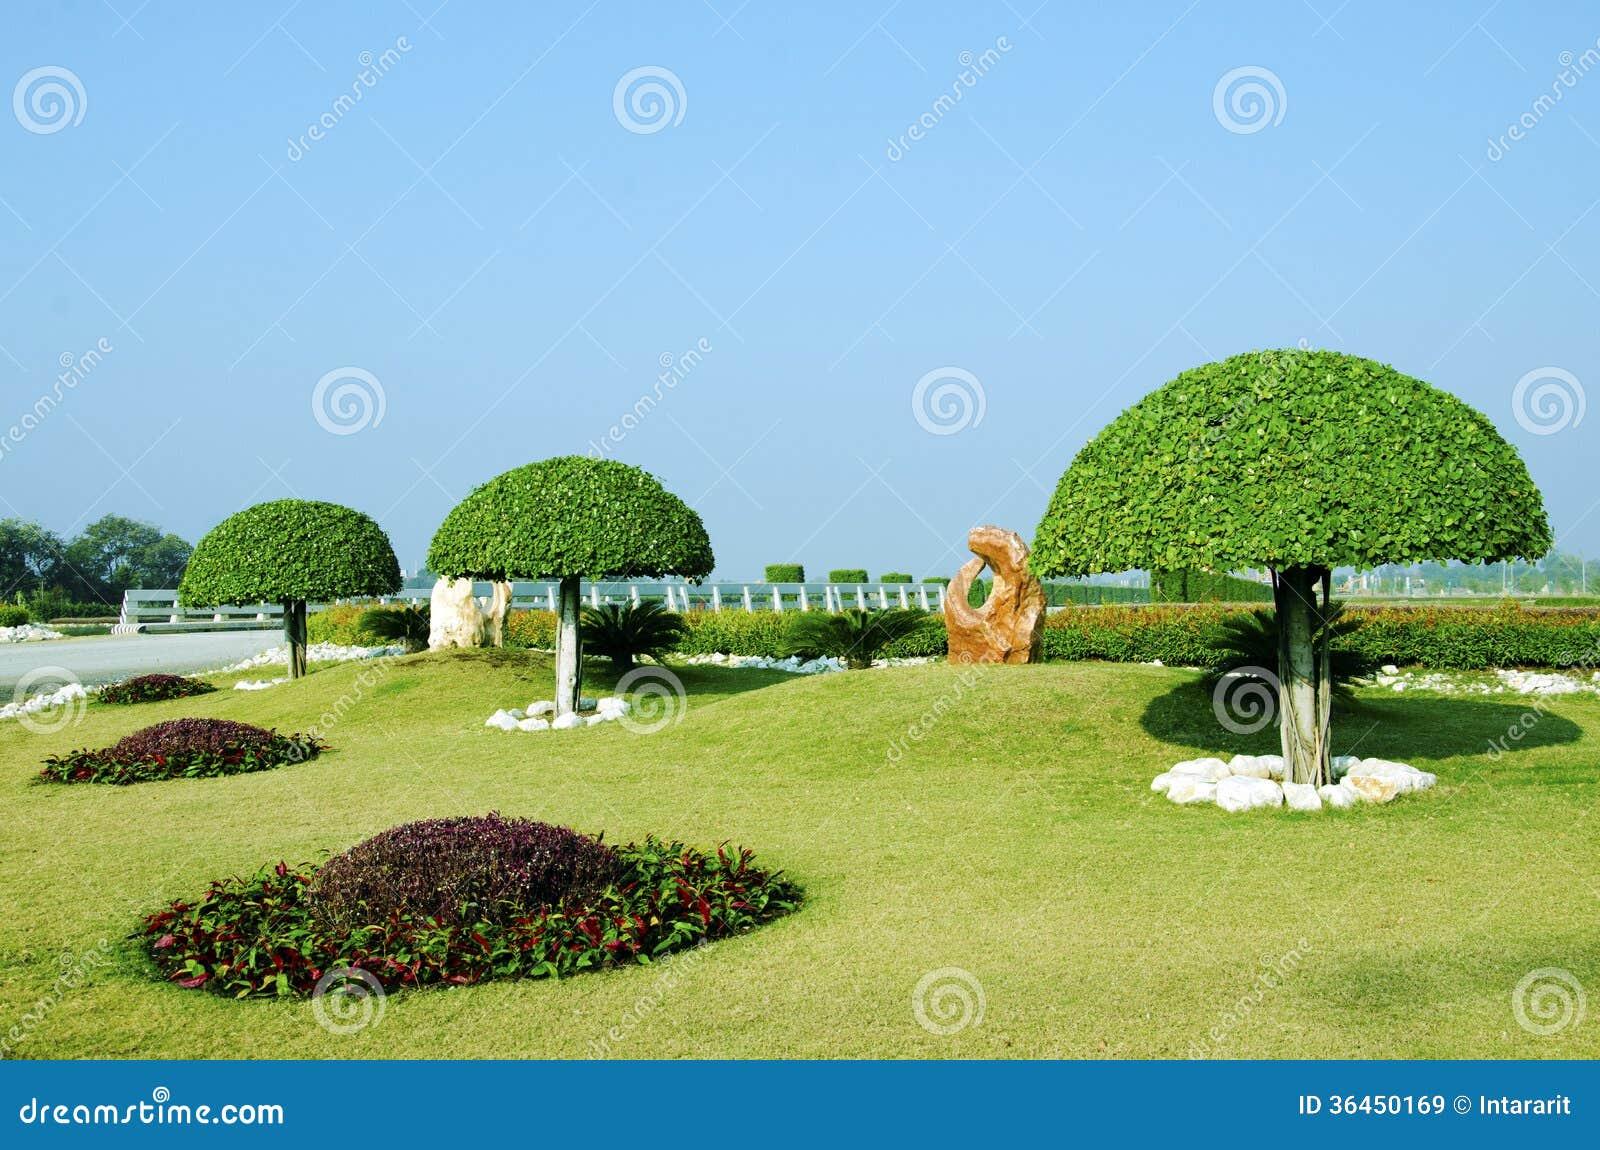 d coration d 39 arbre de jardin images libres de droits image 36450169. Black Bedroom Furniture Sets. Home Design Ideas